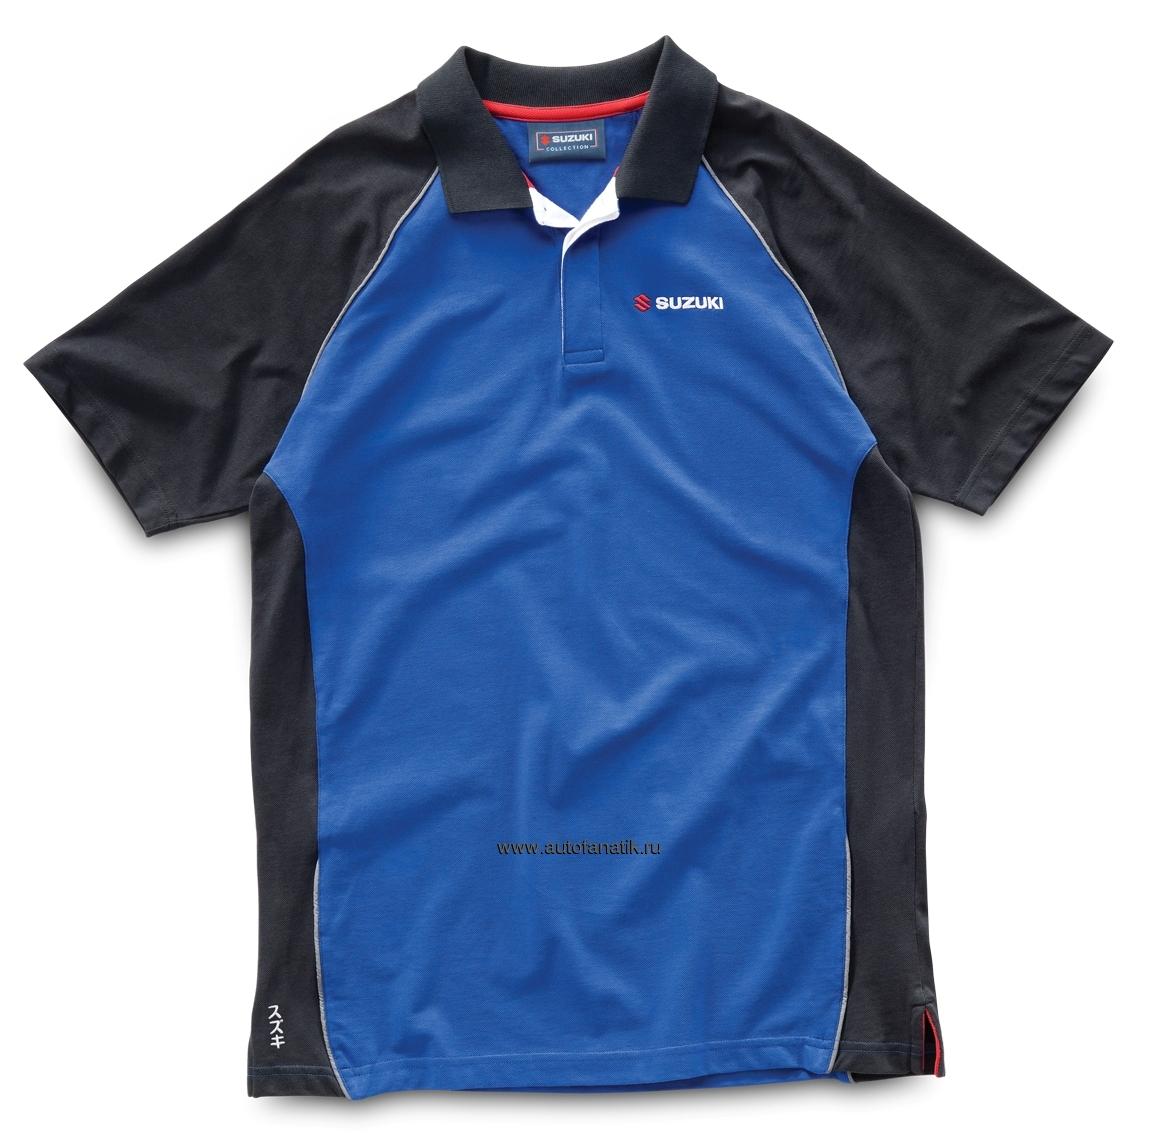 suzuki men s polo shirt blue black 990f0blpm100s 3300. Black Bedroom Furniture Sets. Home Design Ideas